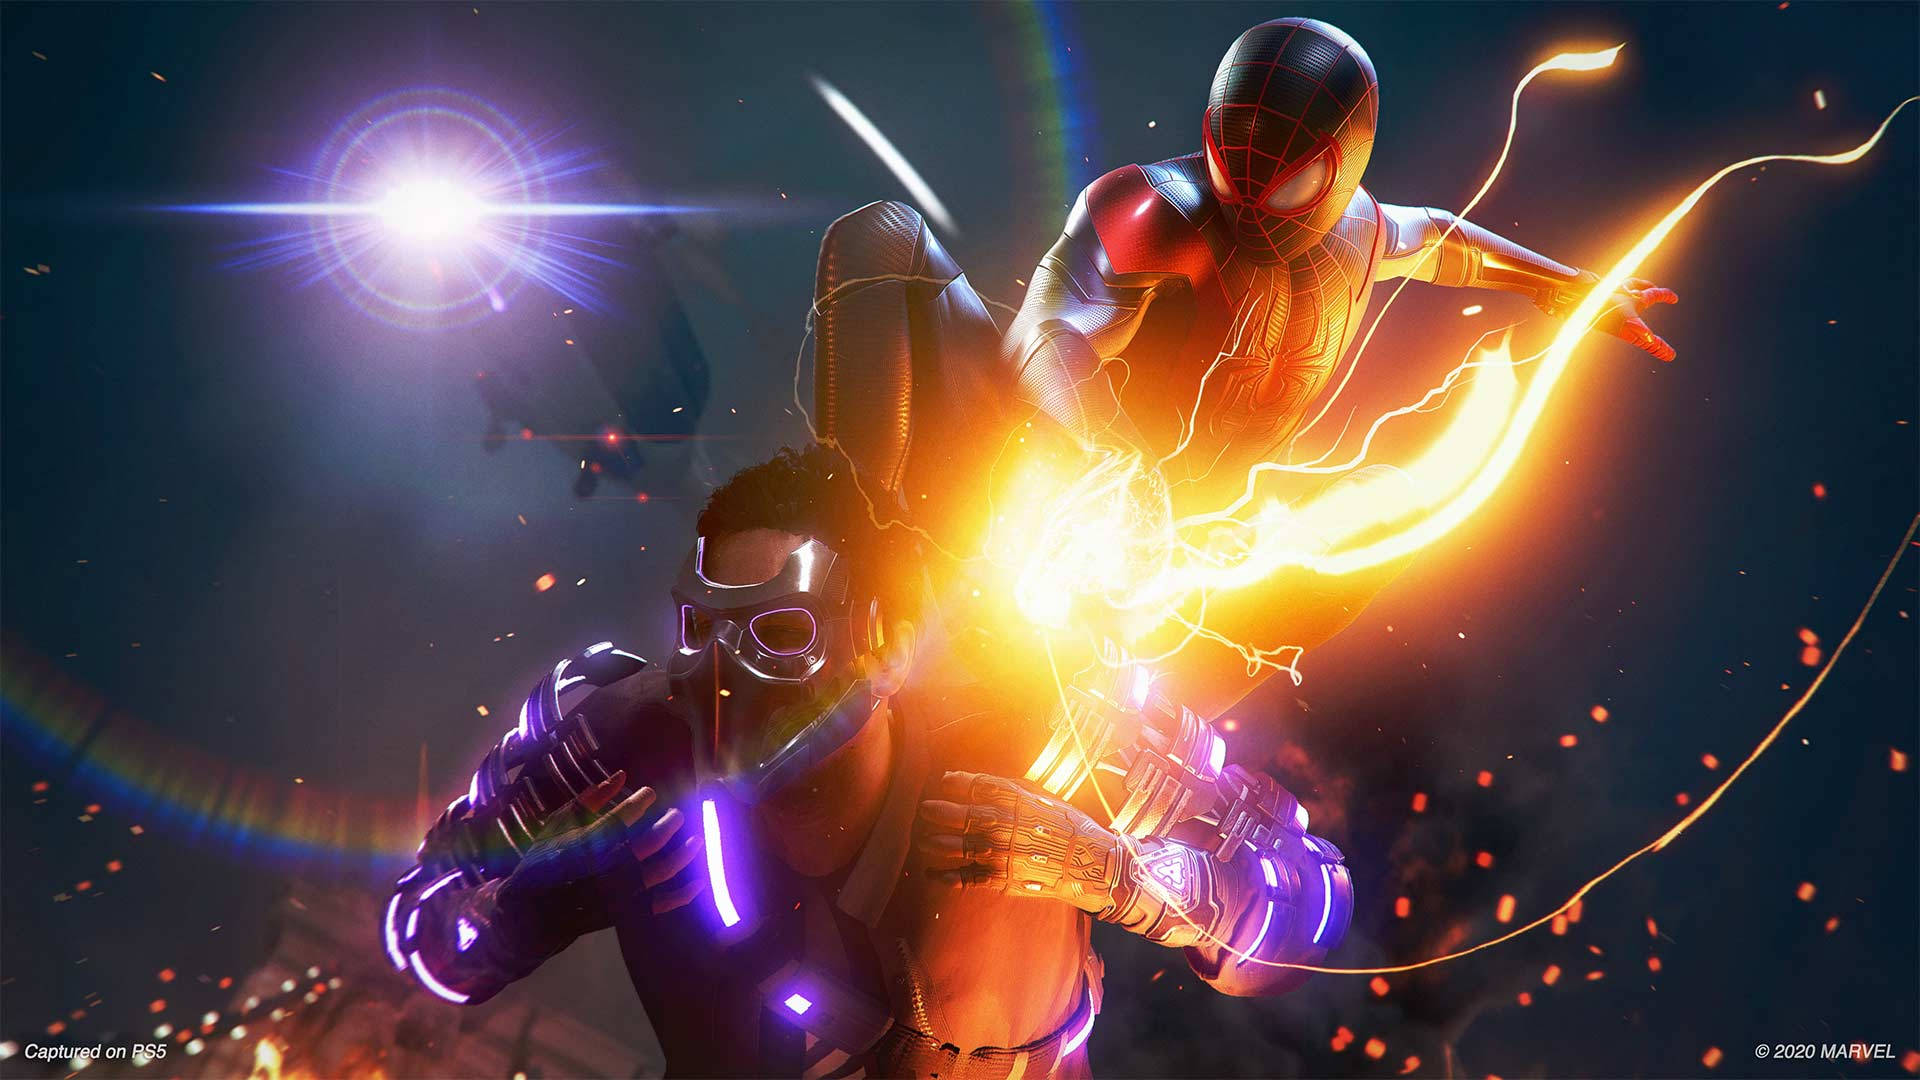 Marvel's Spider-Man: Miles Morales Venom power